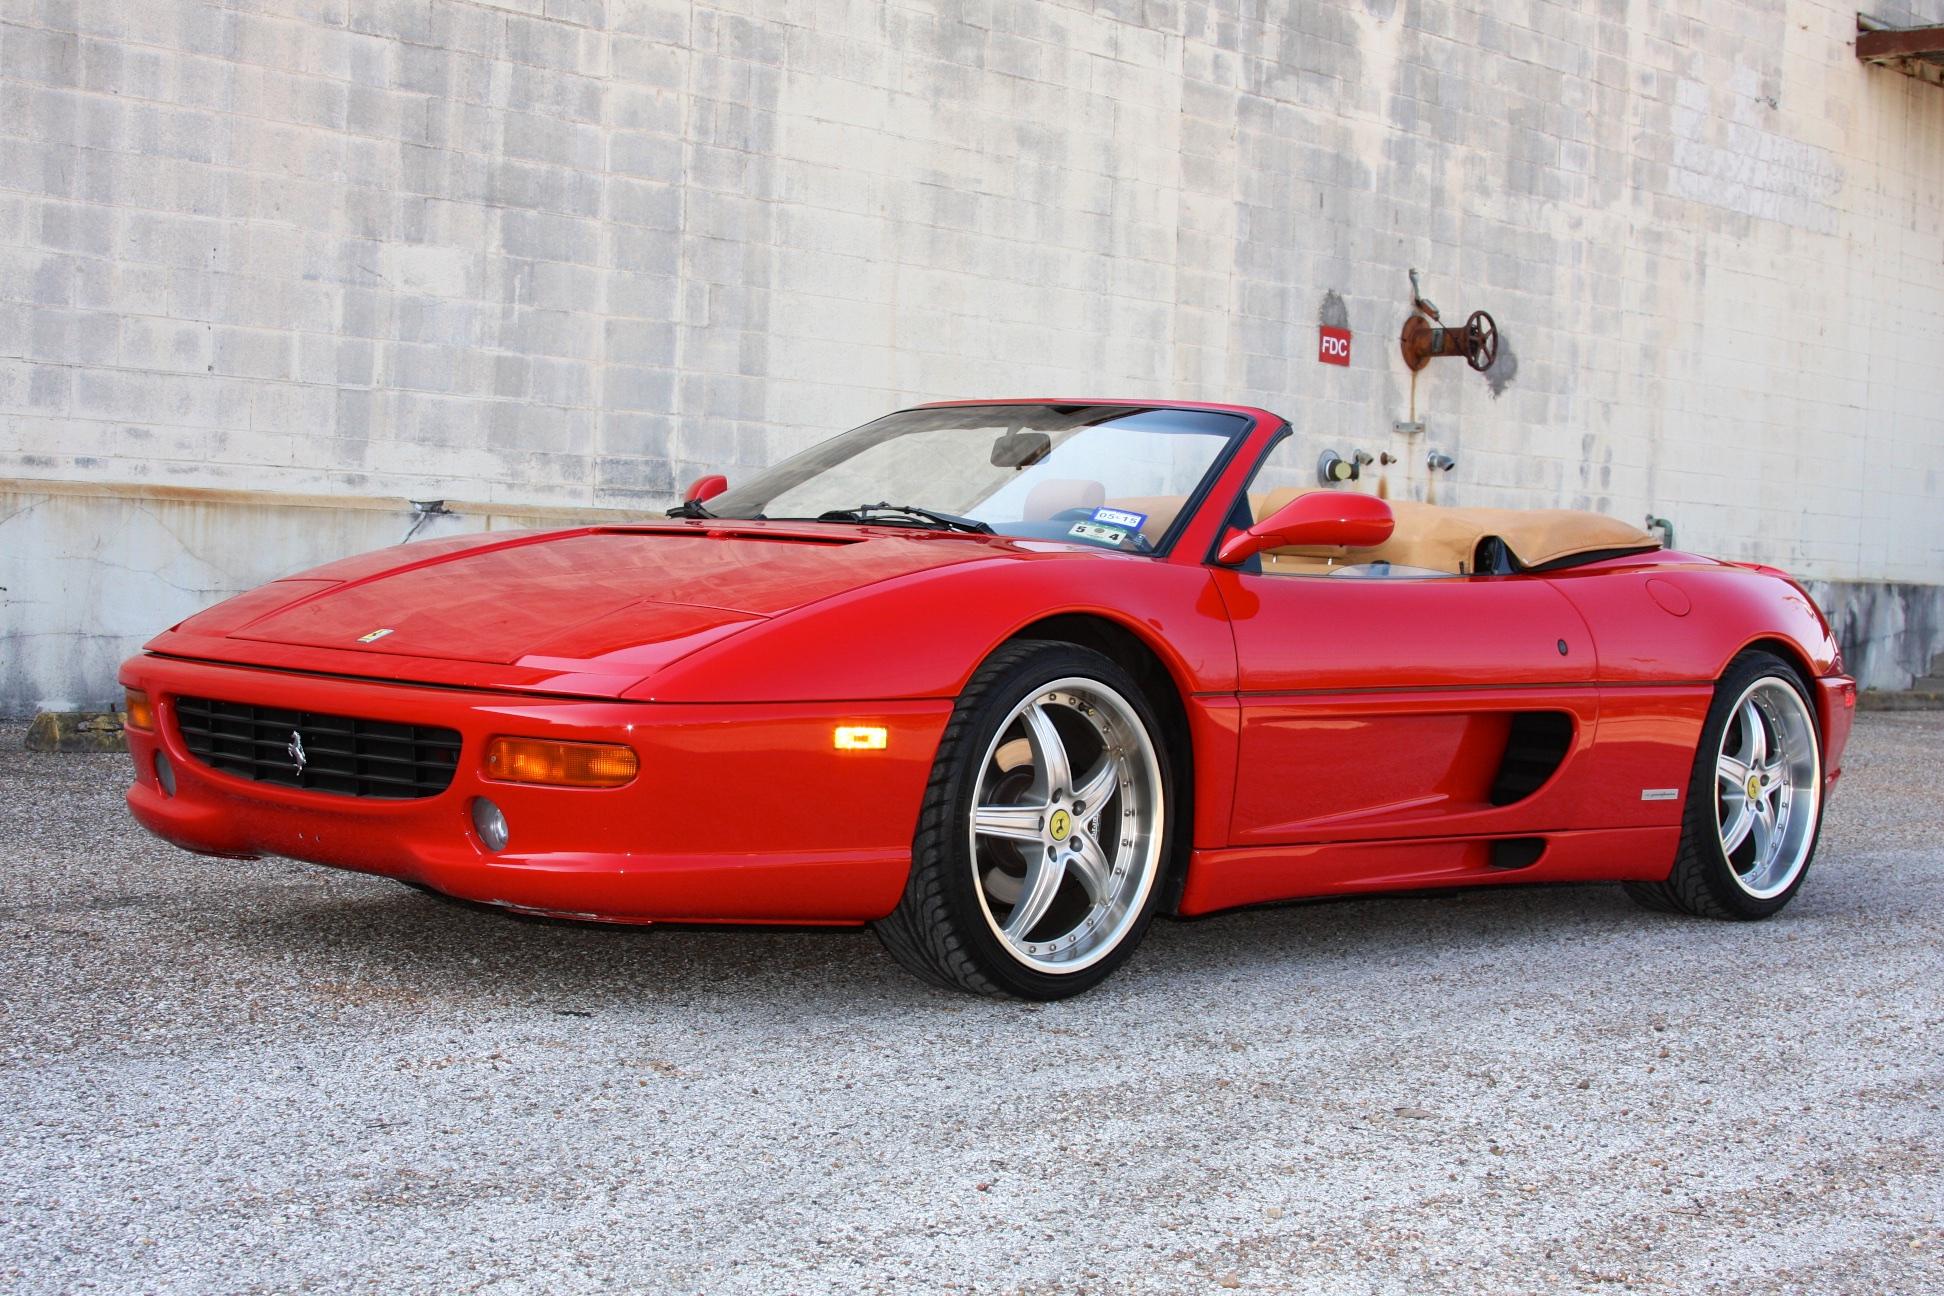 1996 Ferrari F355 Spider (T0105008) - 08.jpg